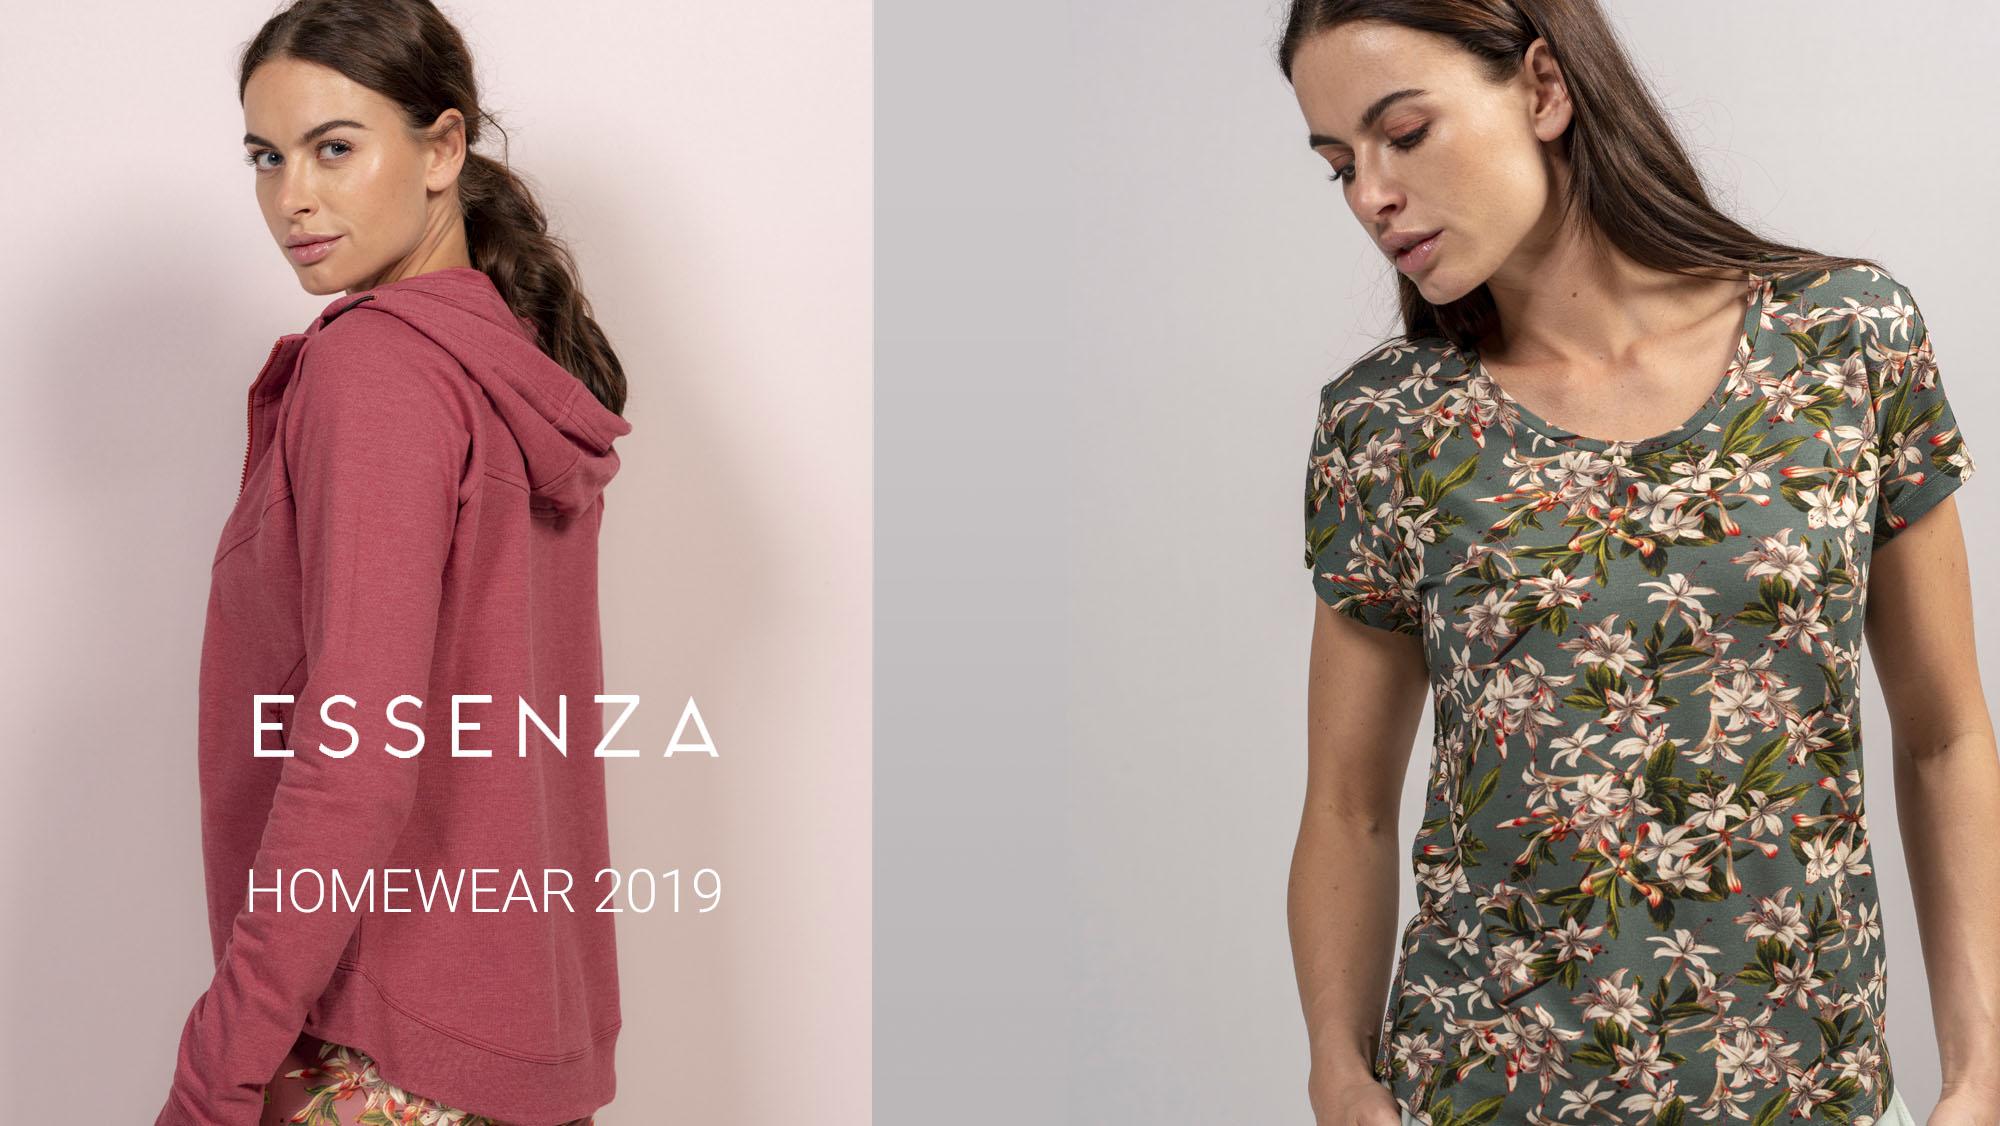 Essenza Homewear